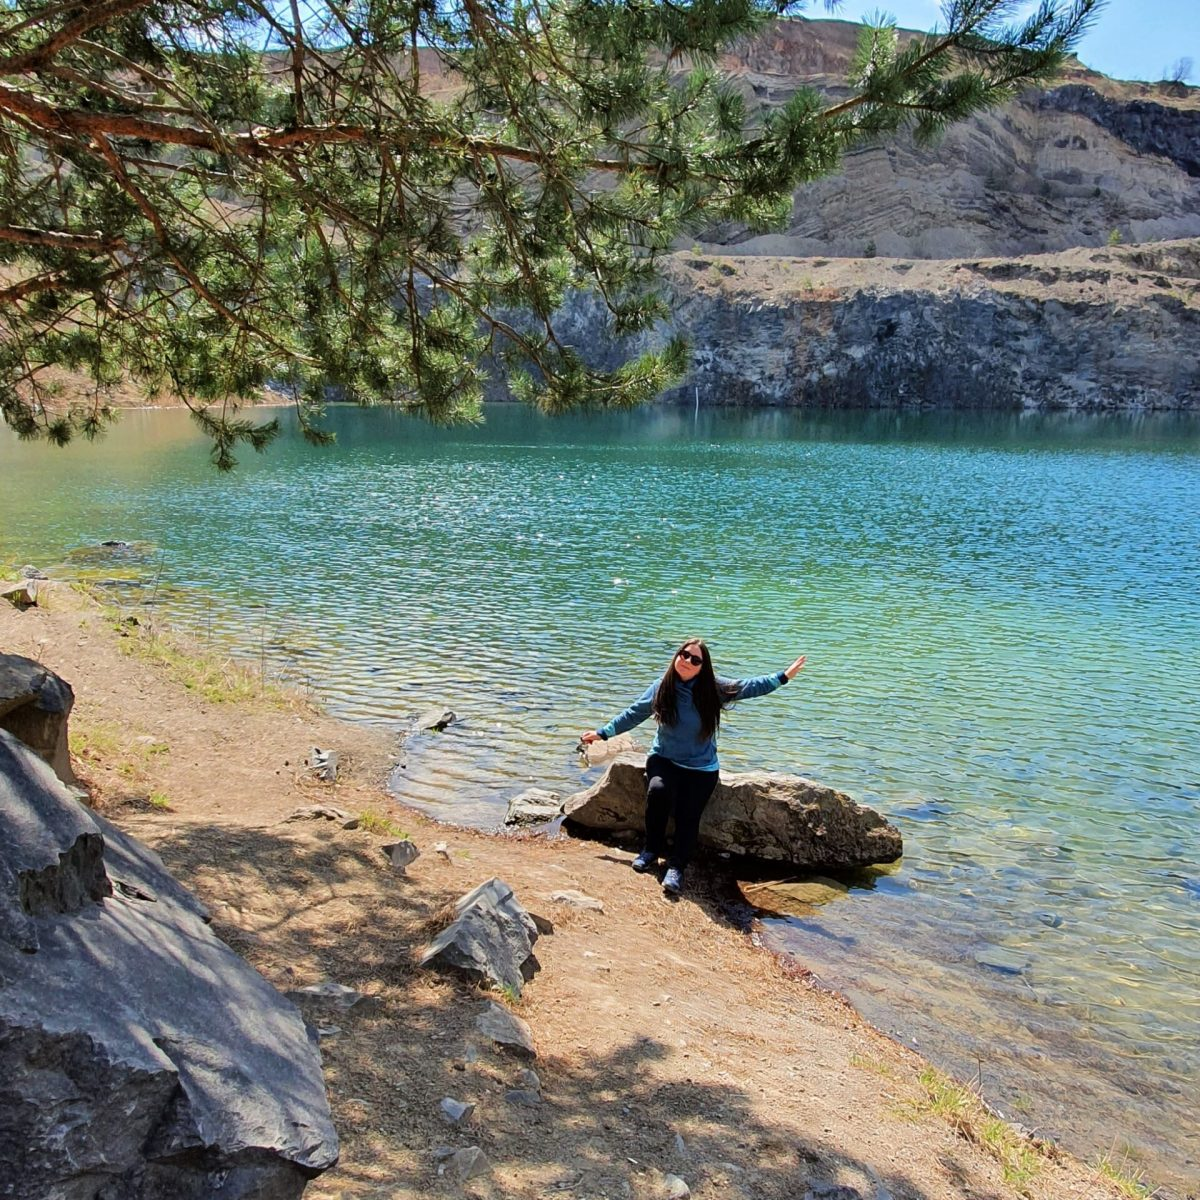 Lacul de Smarald de la Racoș